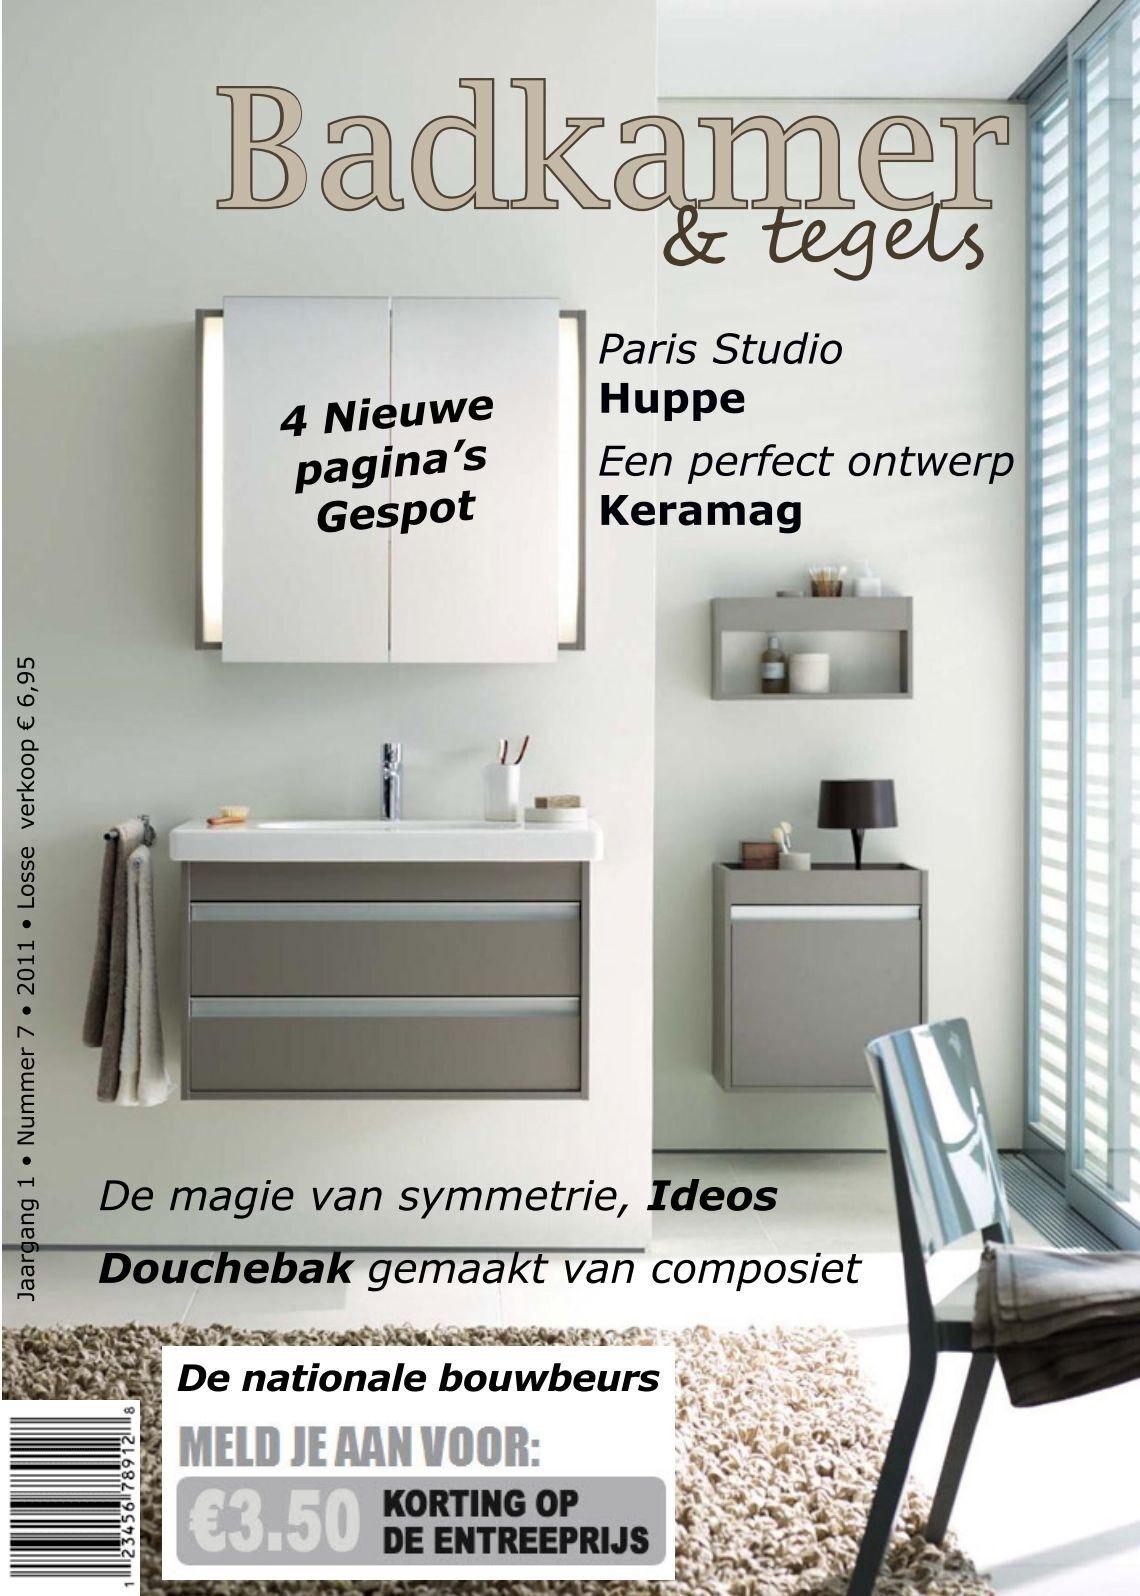 free magazines from badkamer.en.tegels..badkamerdocumentatie.nl, Meubels Ideeën